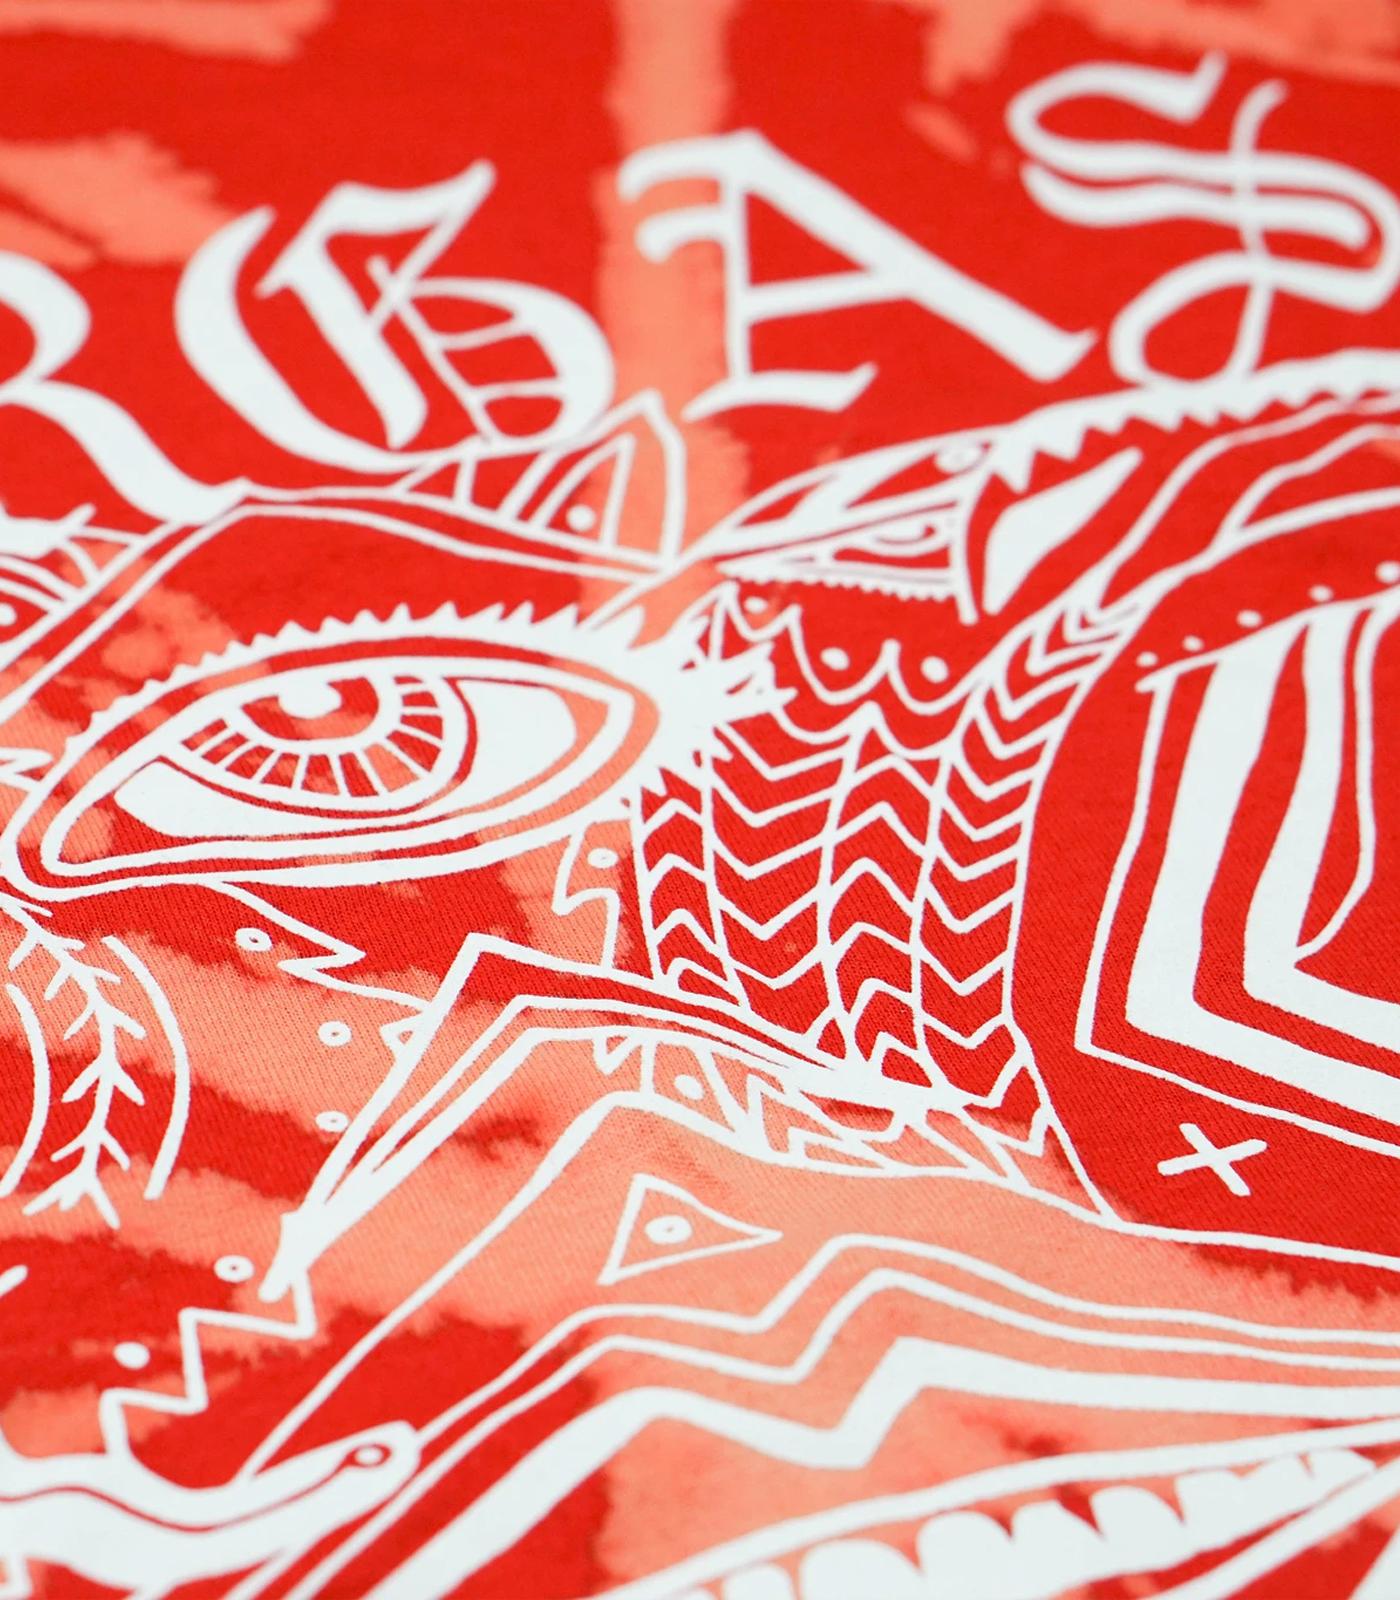 Goth Tie-Dye Red